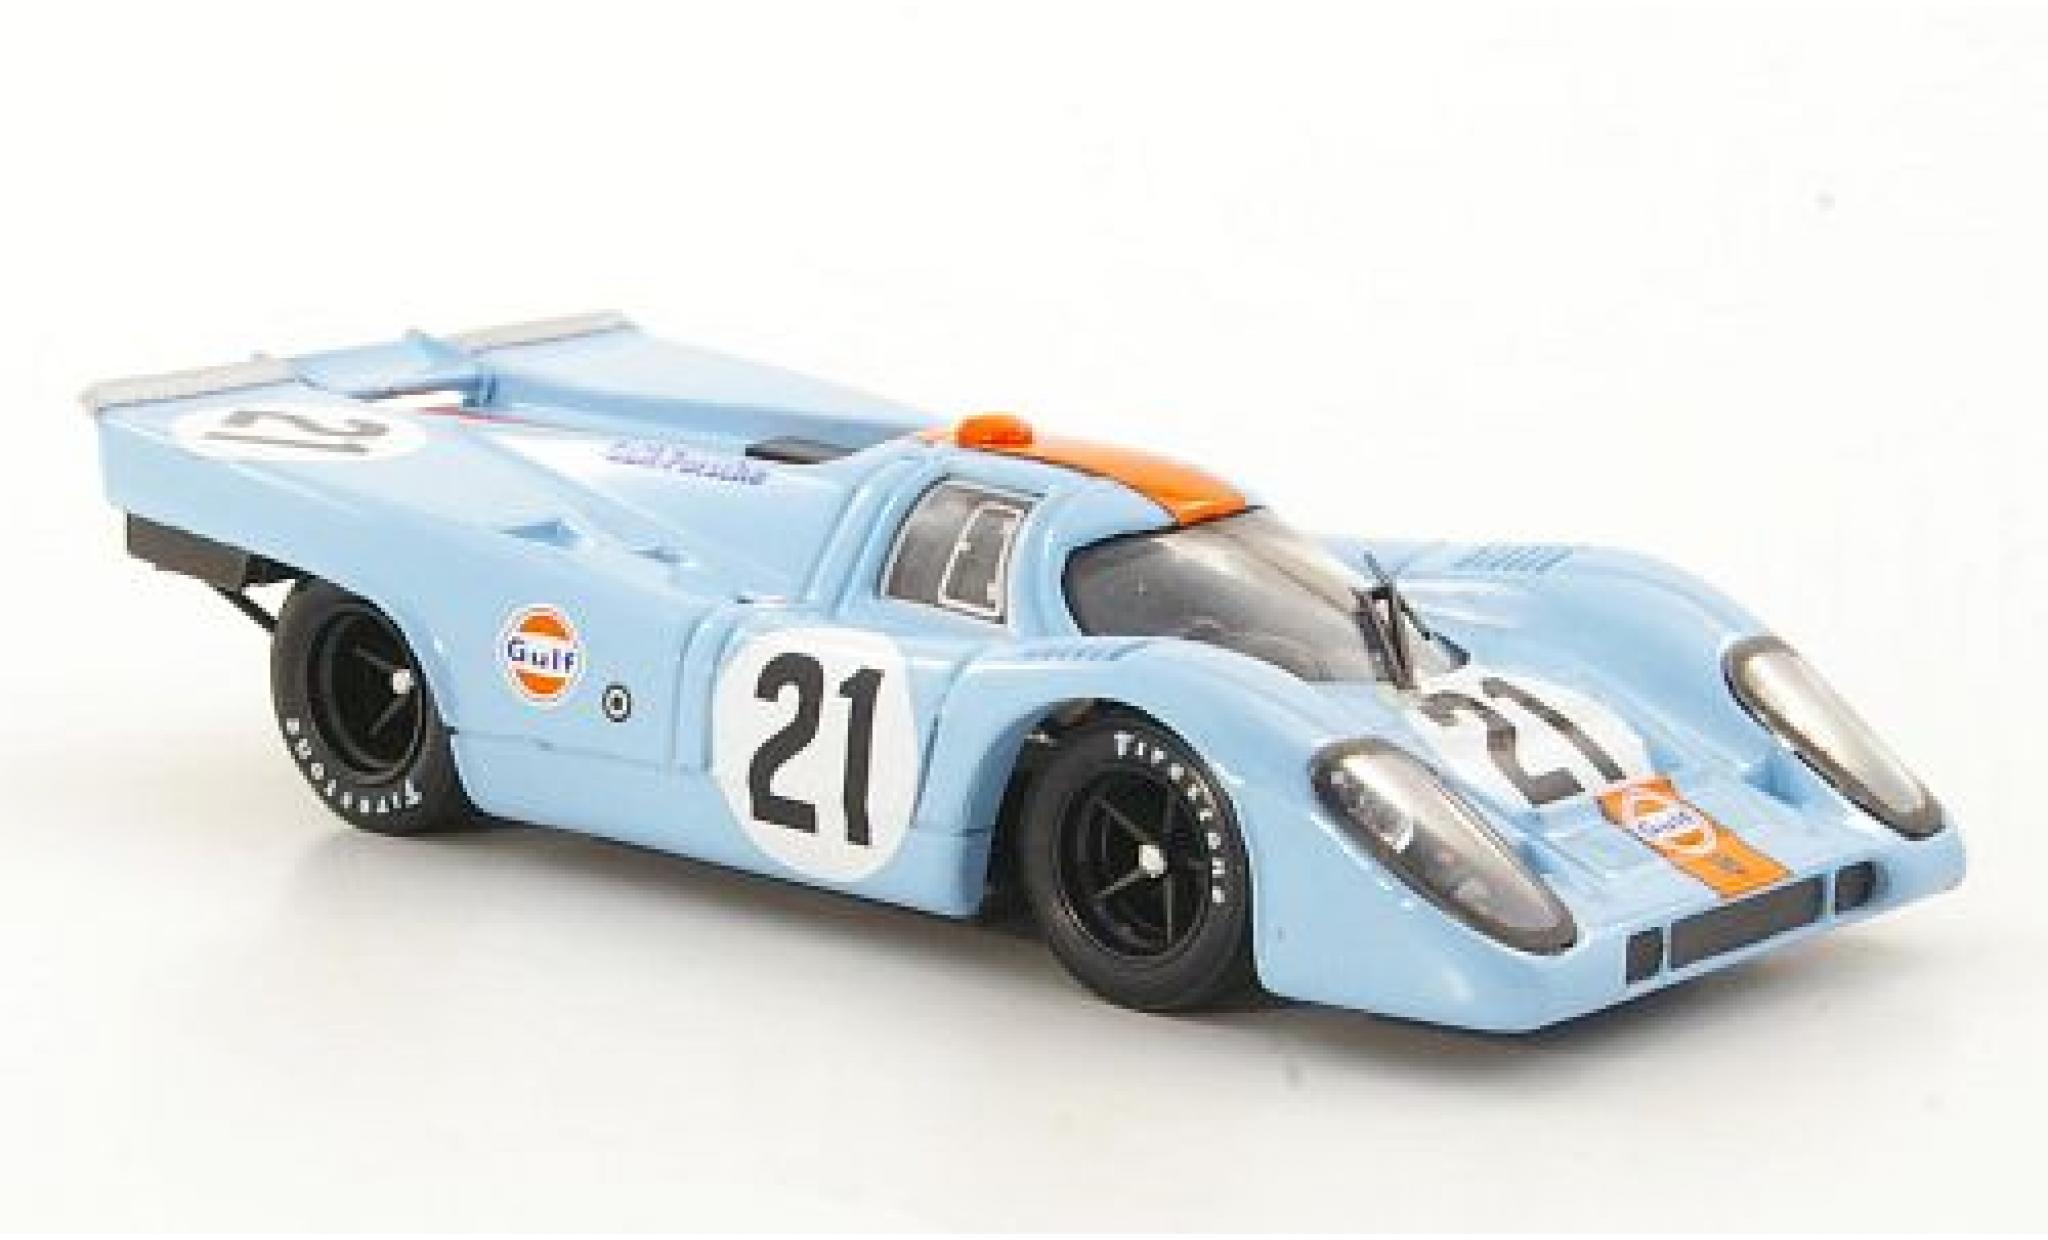 Porsche 917 1970 1/43 Brumm K RHD No.21 JWA-Gulf Racing Team Gulf 24h Le Mans P.Rodriguez/L.Kinnunen